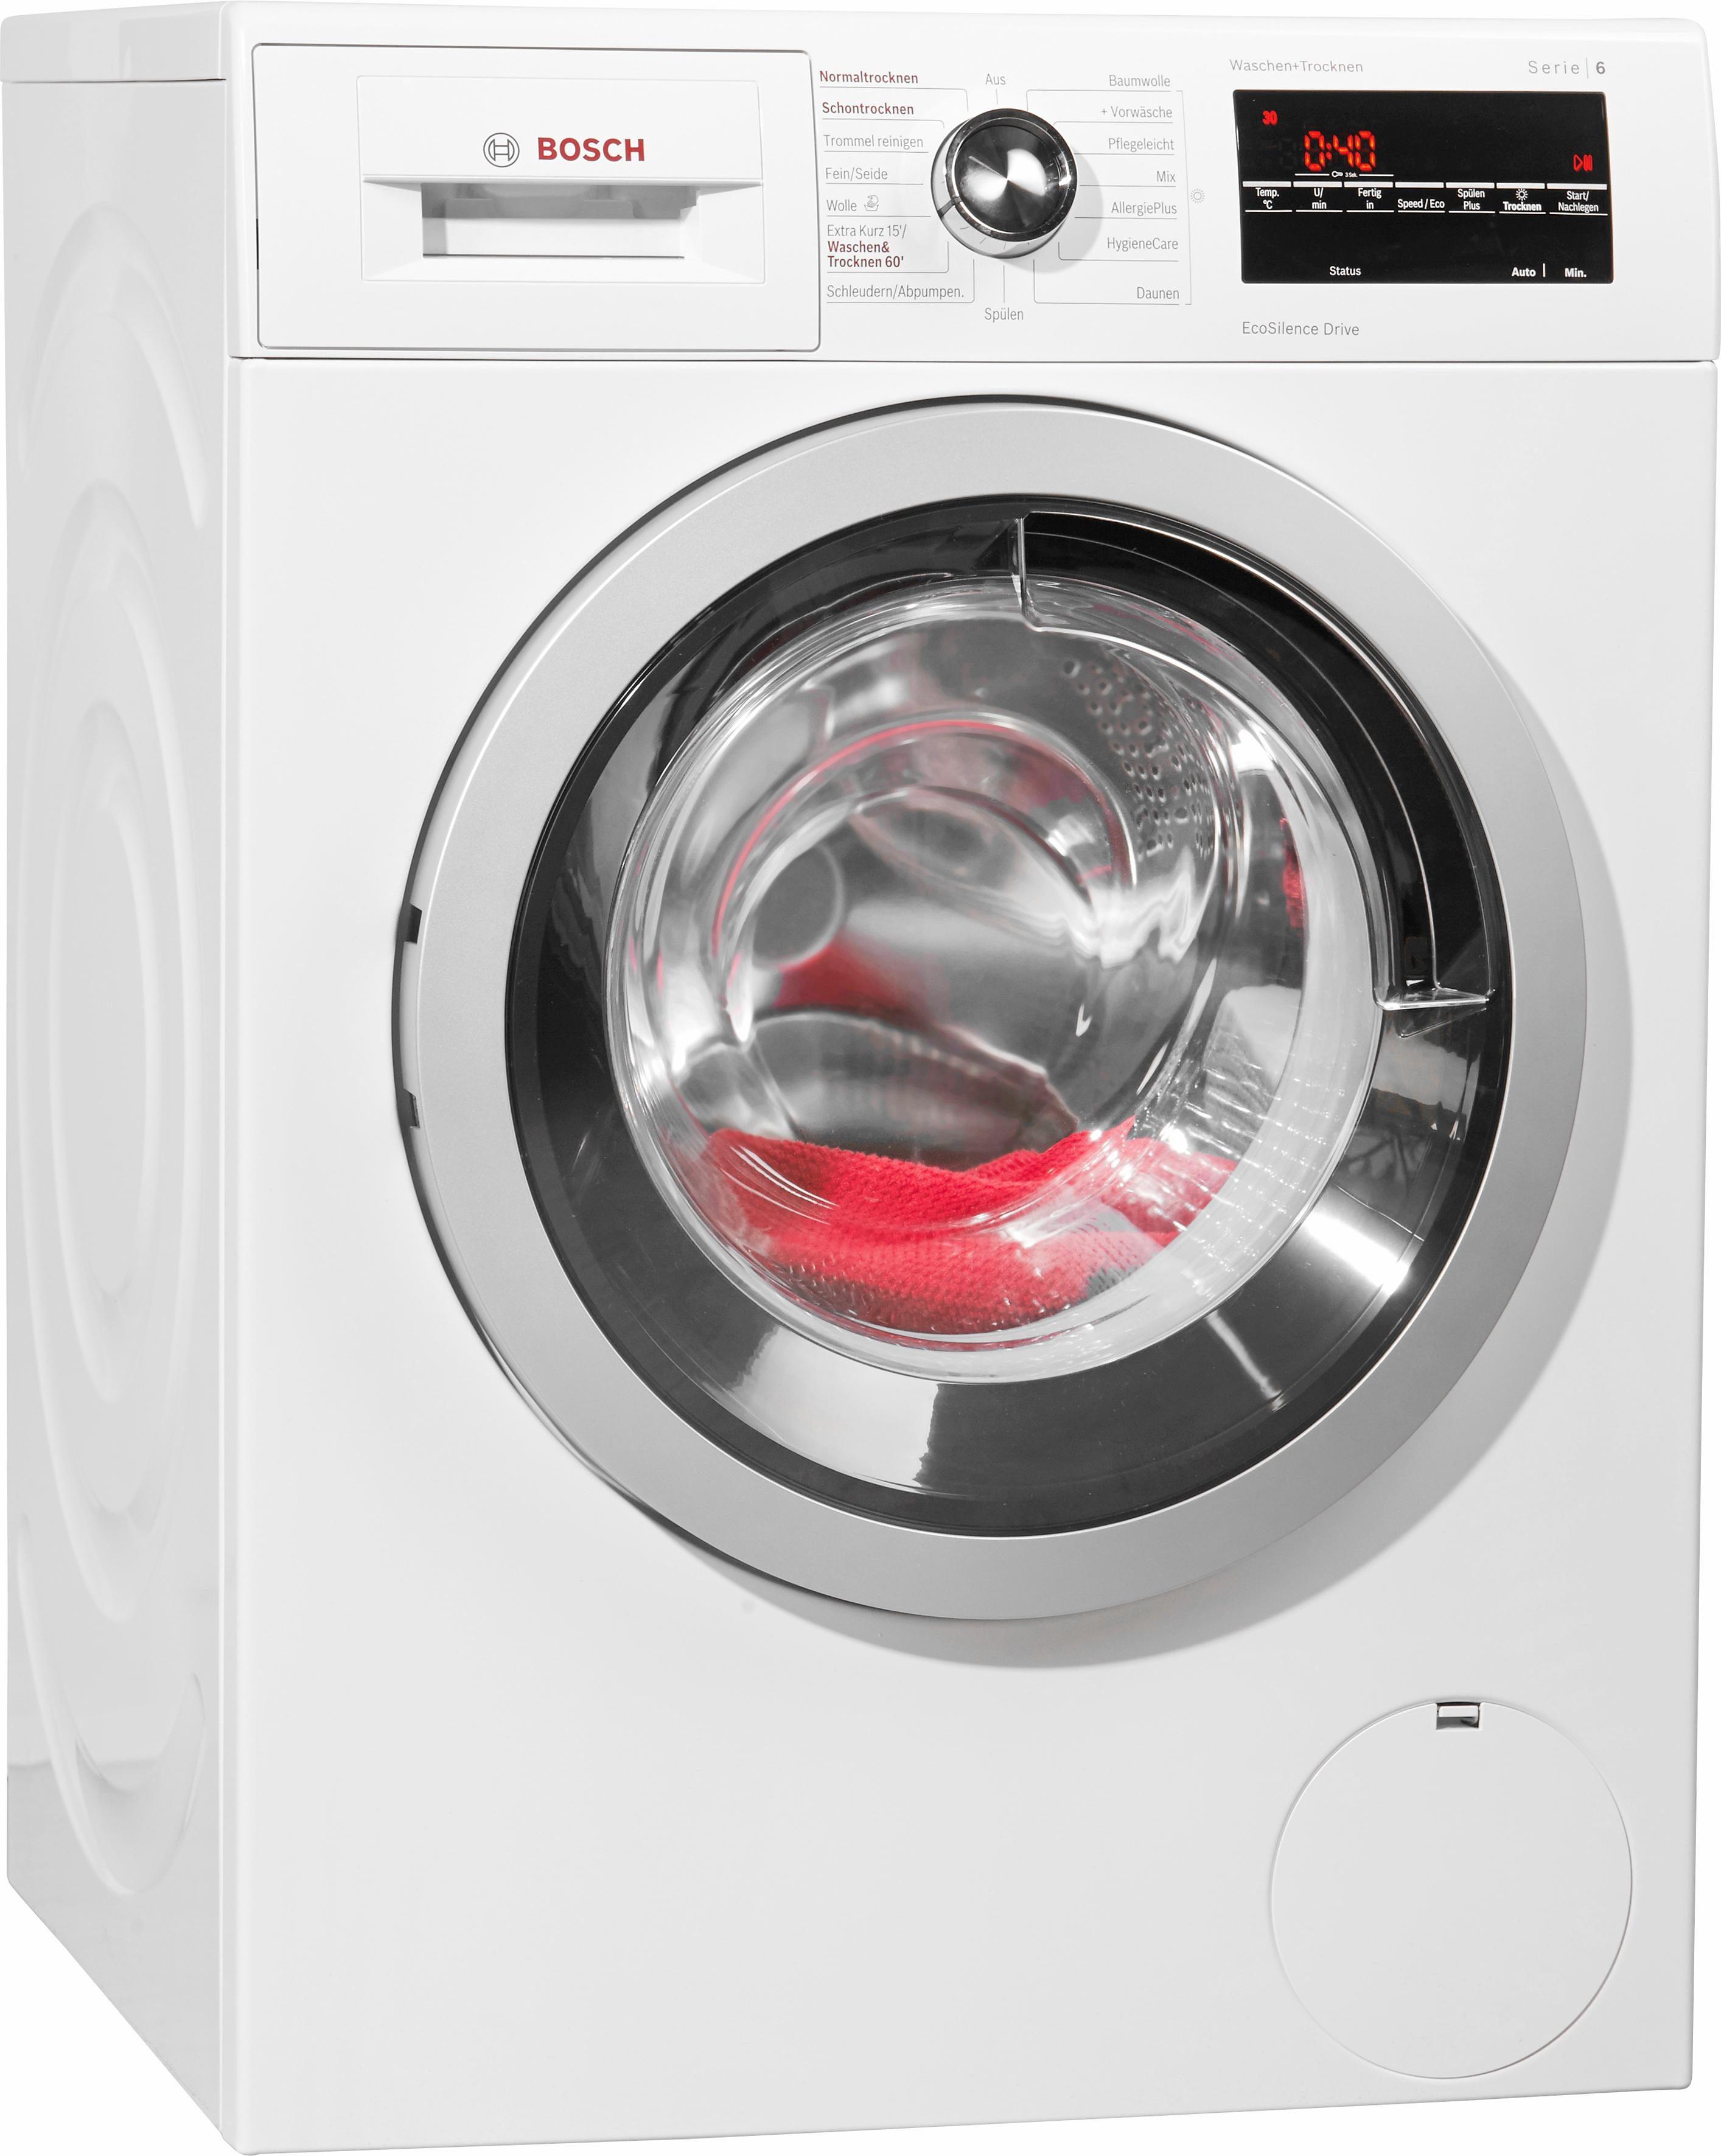 BOSCH Waschtrockner WVG30442, A, 8 kg / 5 kg, 1500 U/Min